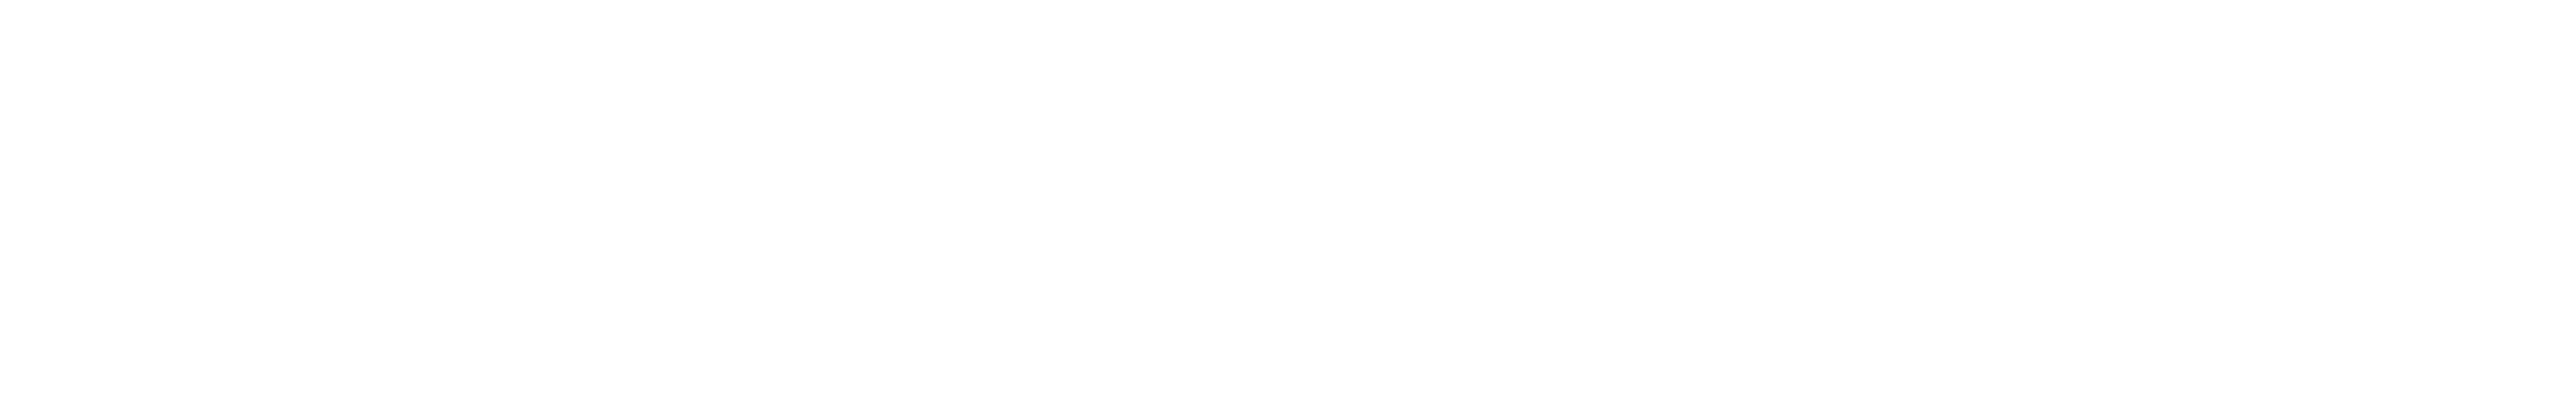 WW_Schatz